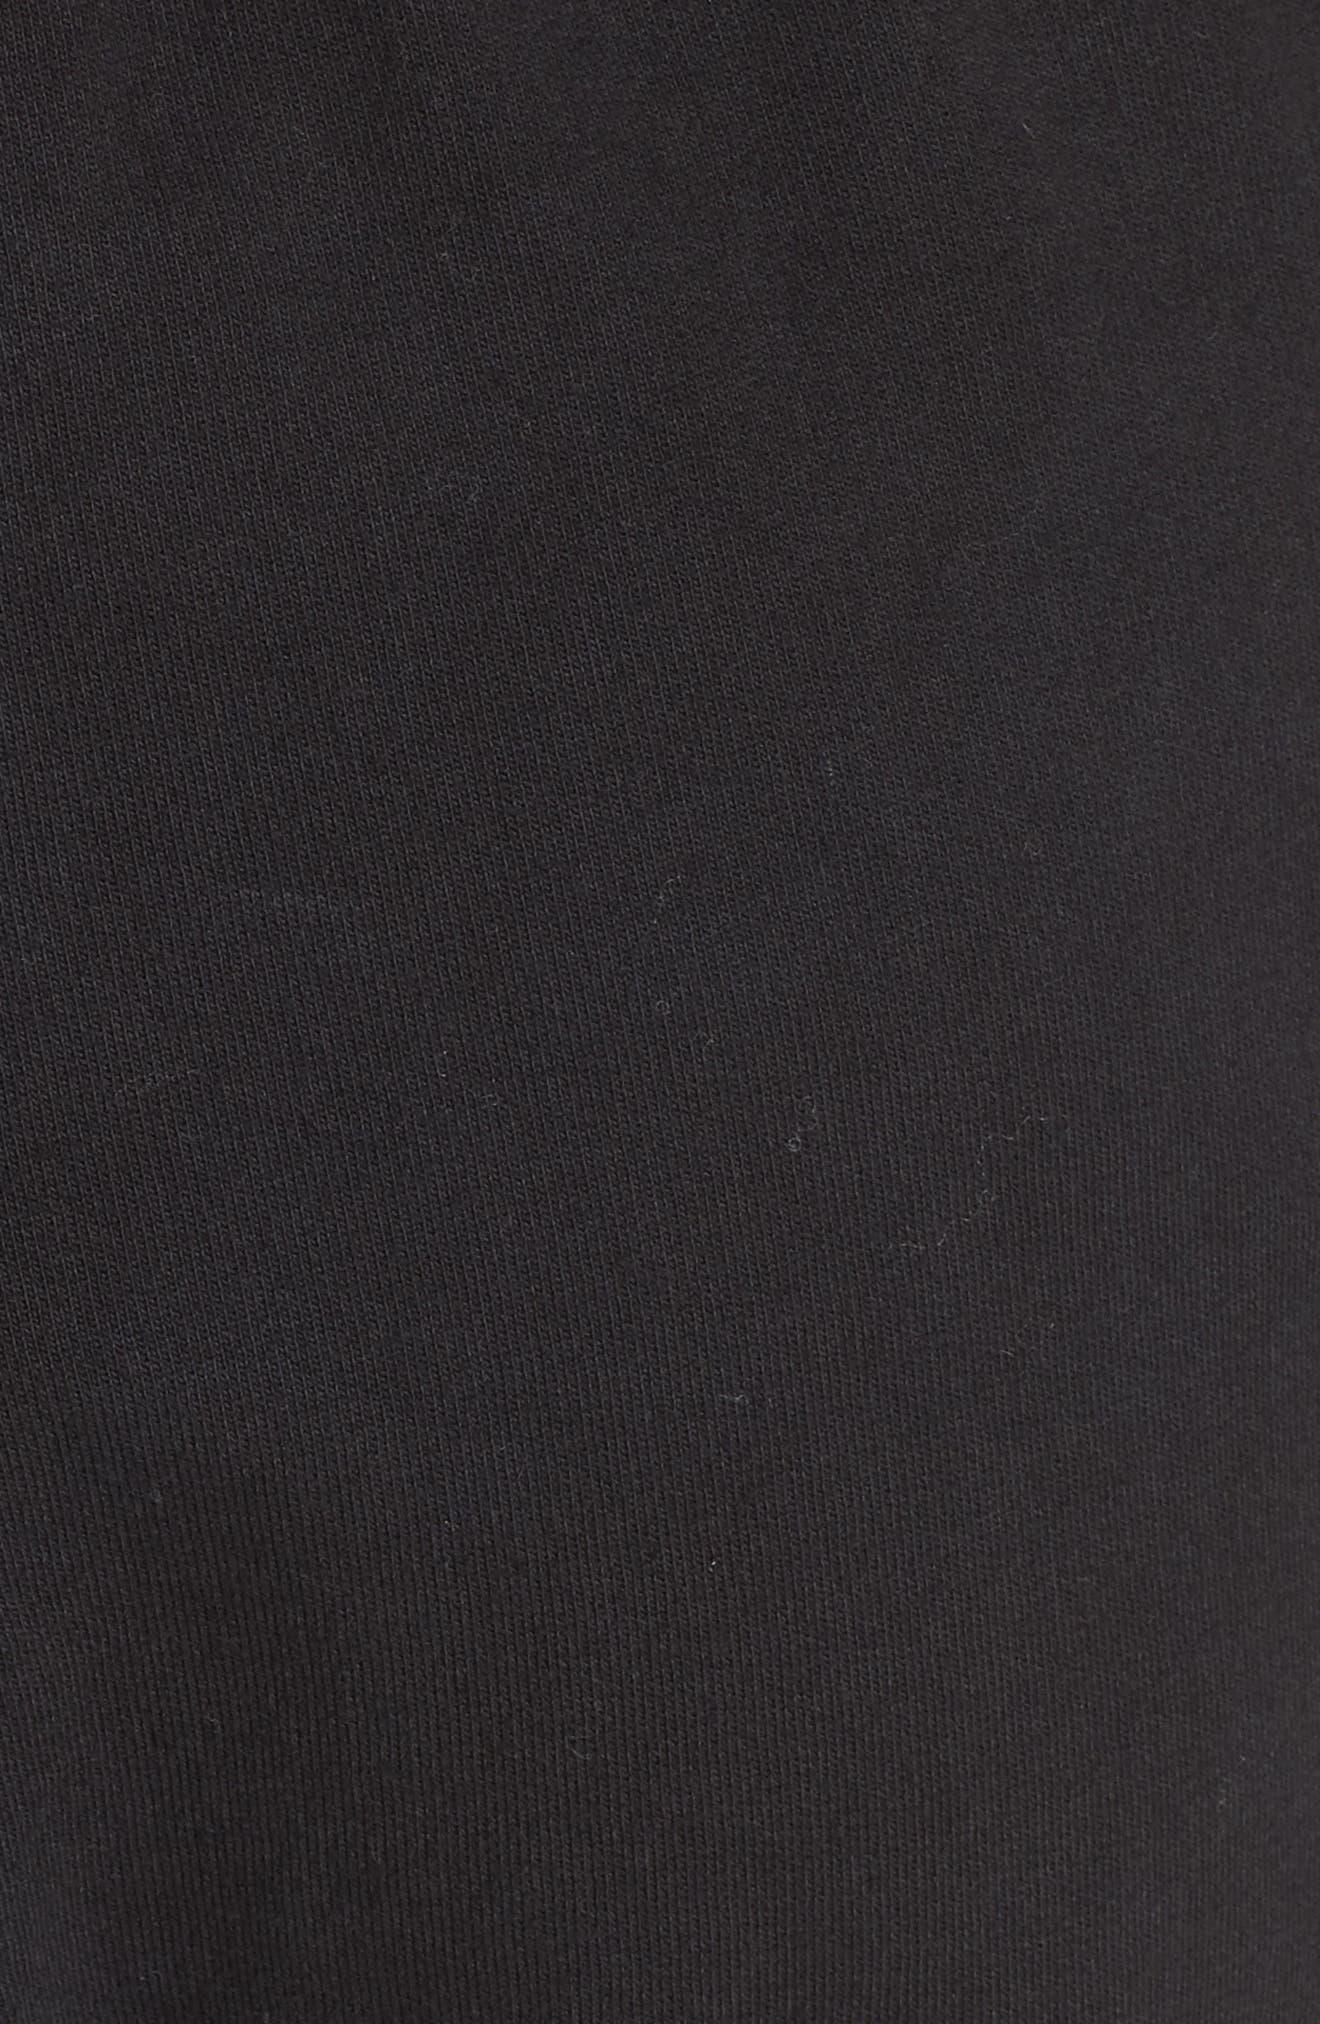 Side Tie Jogger Pants,                             Alternate thumbnail 6, color,                             BLACK